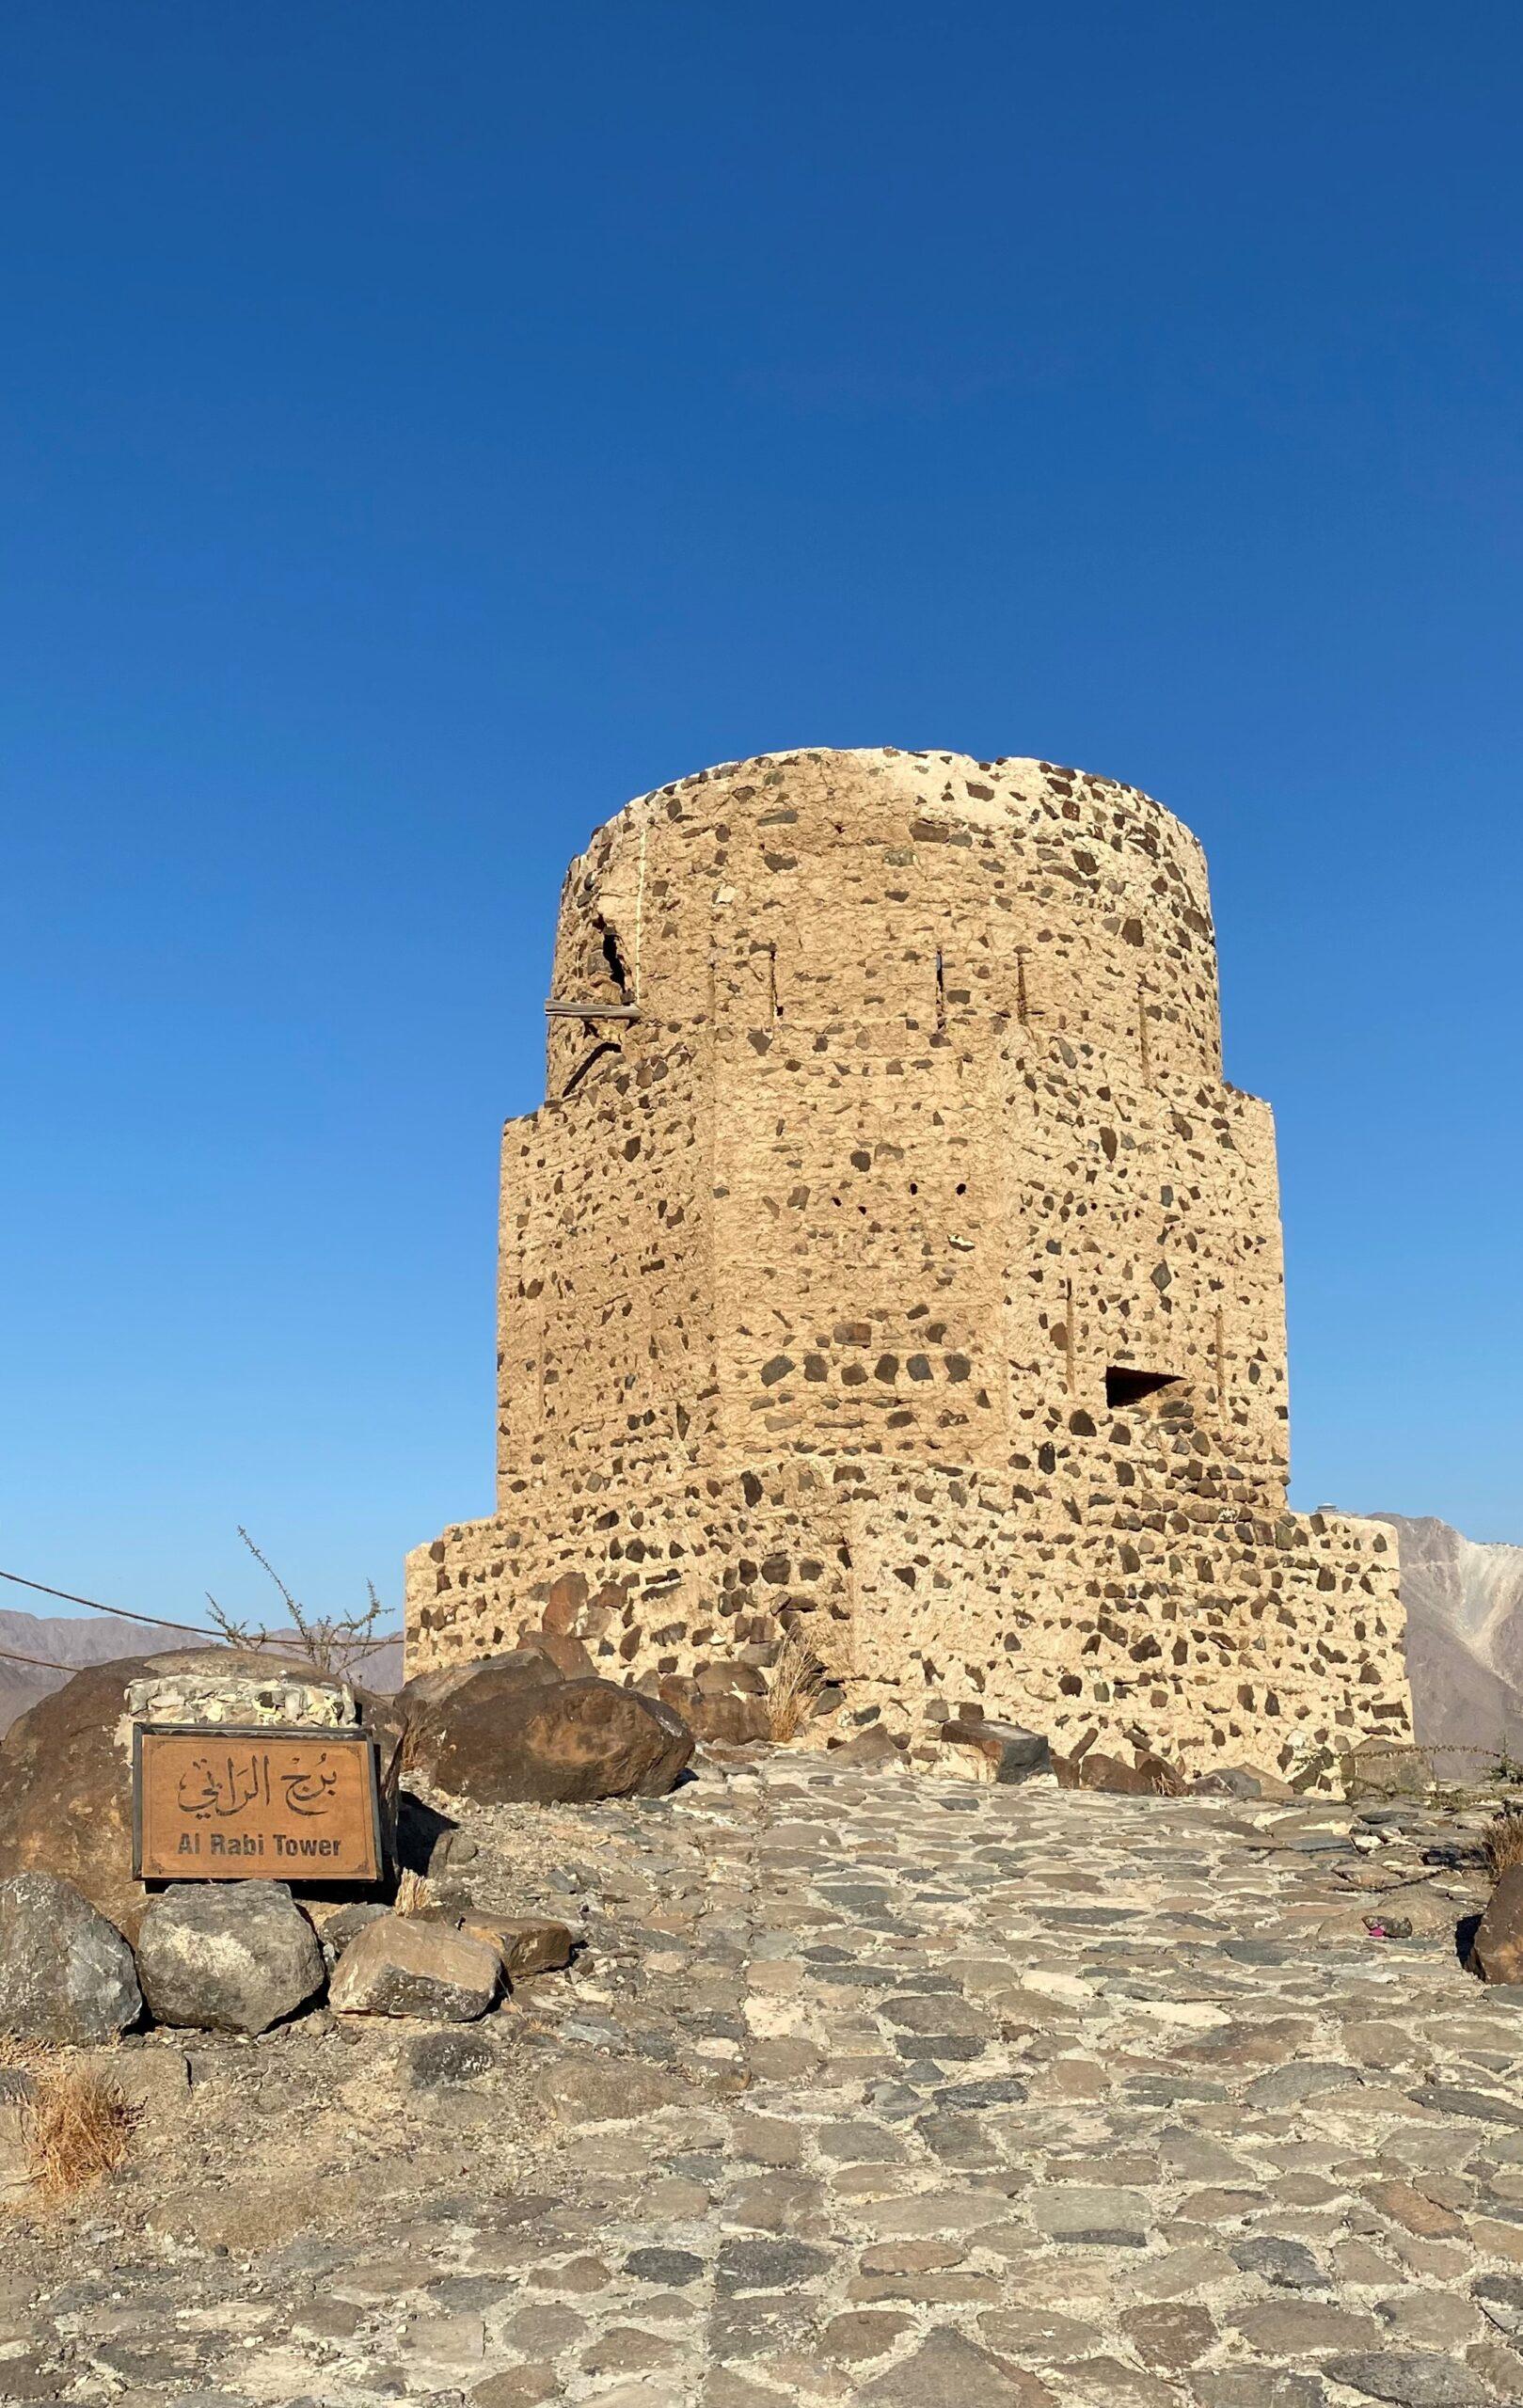 Rabi Tower